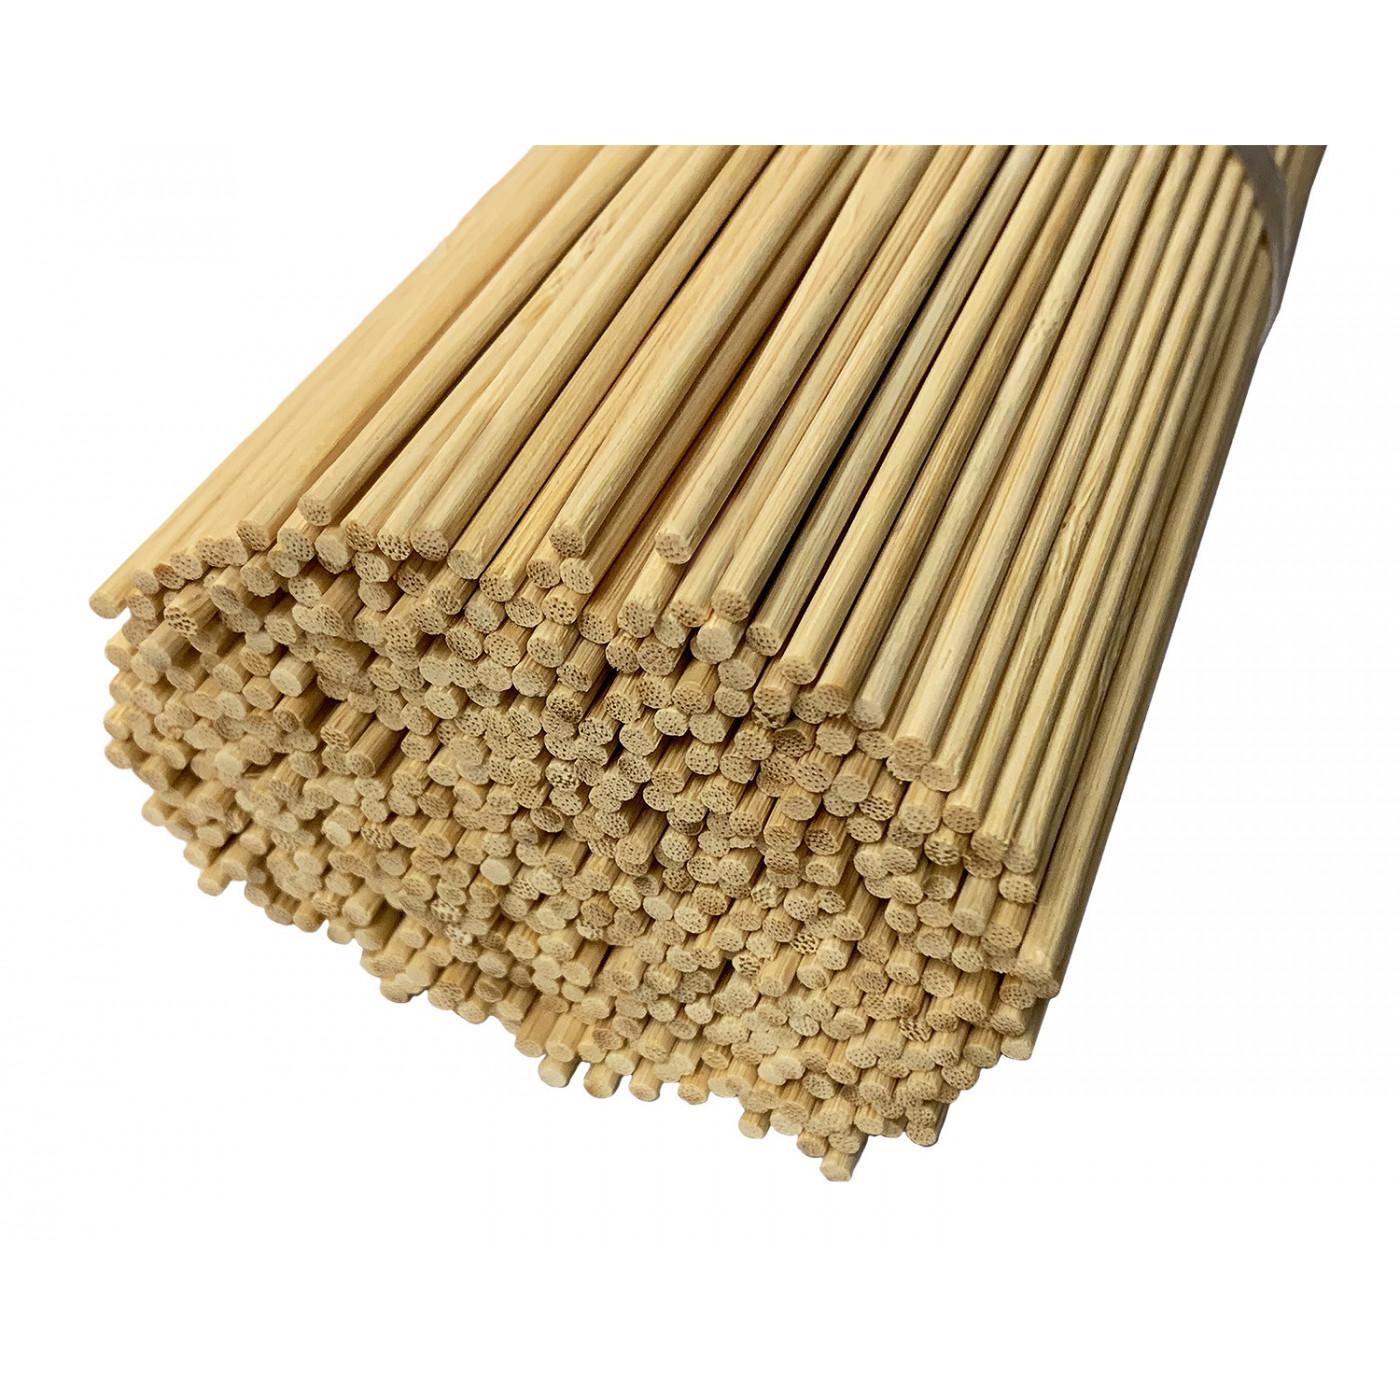 Set of 500 long bamboo sticks (3 mm x 50 cm)